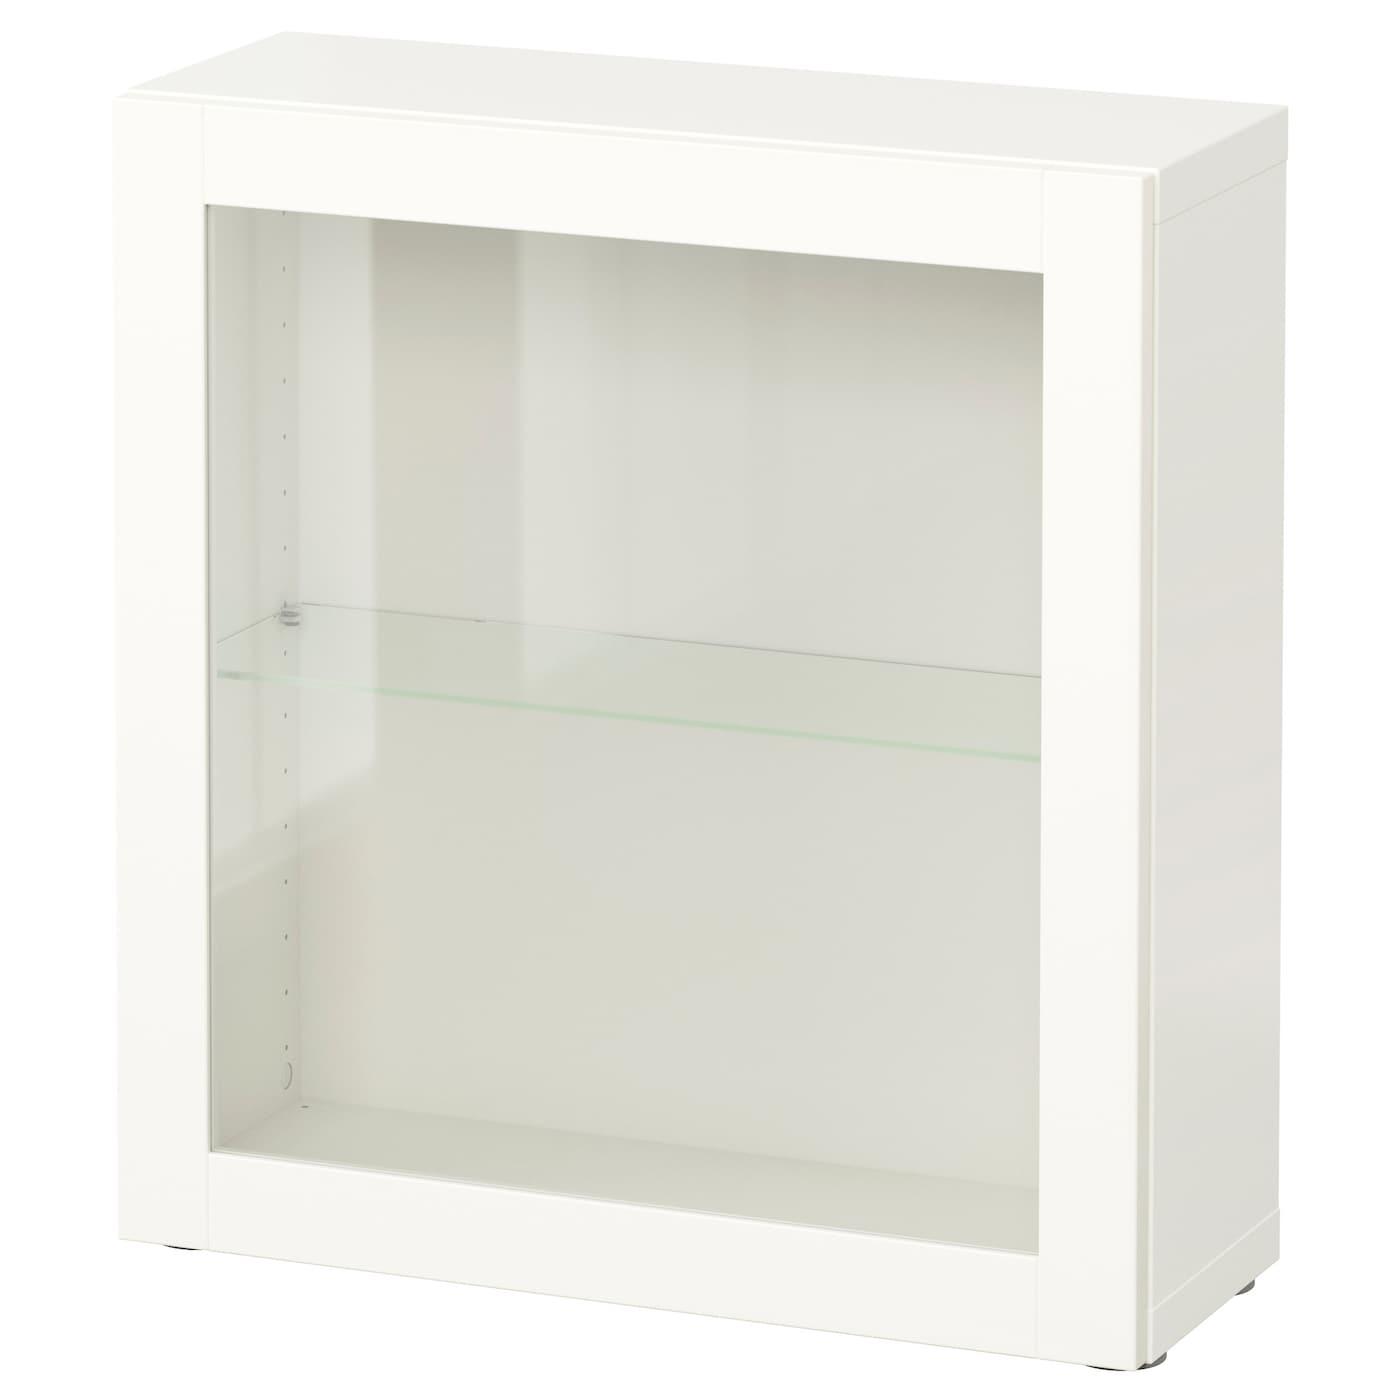 BESTÅ Étagère Avec Porte Vitrée Sindvik Blanc Xx Cm IKEA - Etagere avec porte